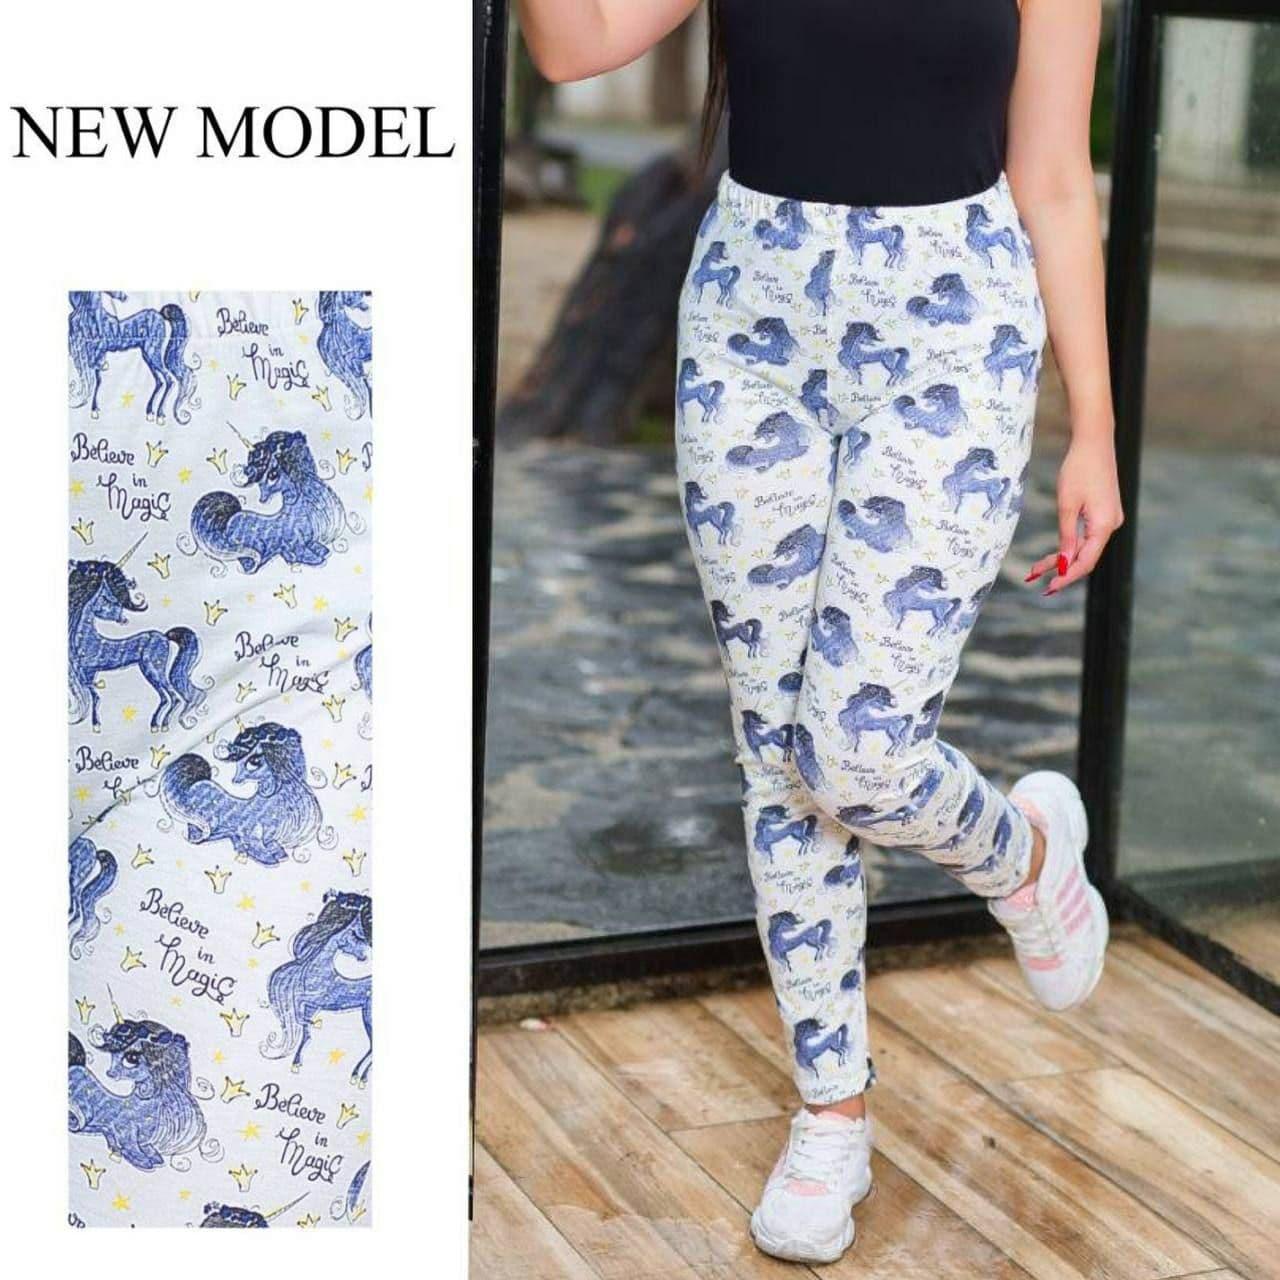 New model spring clothes 1400 pabak.ir 22 - مدل های جدید لباس بهار ۱۴۰۰ + عکس